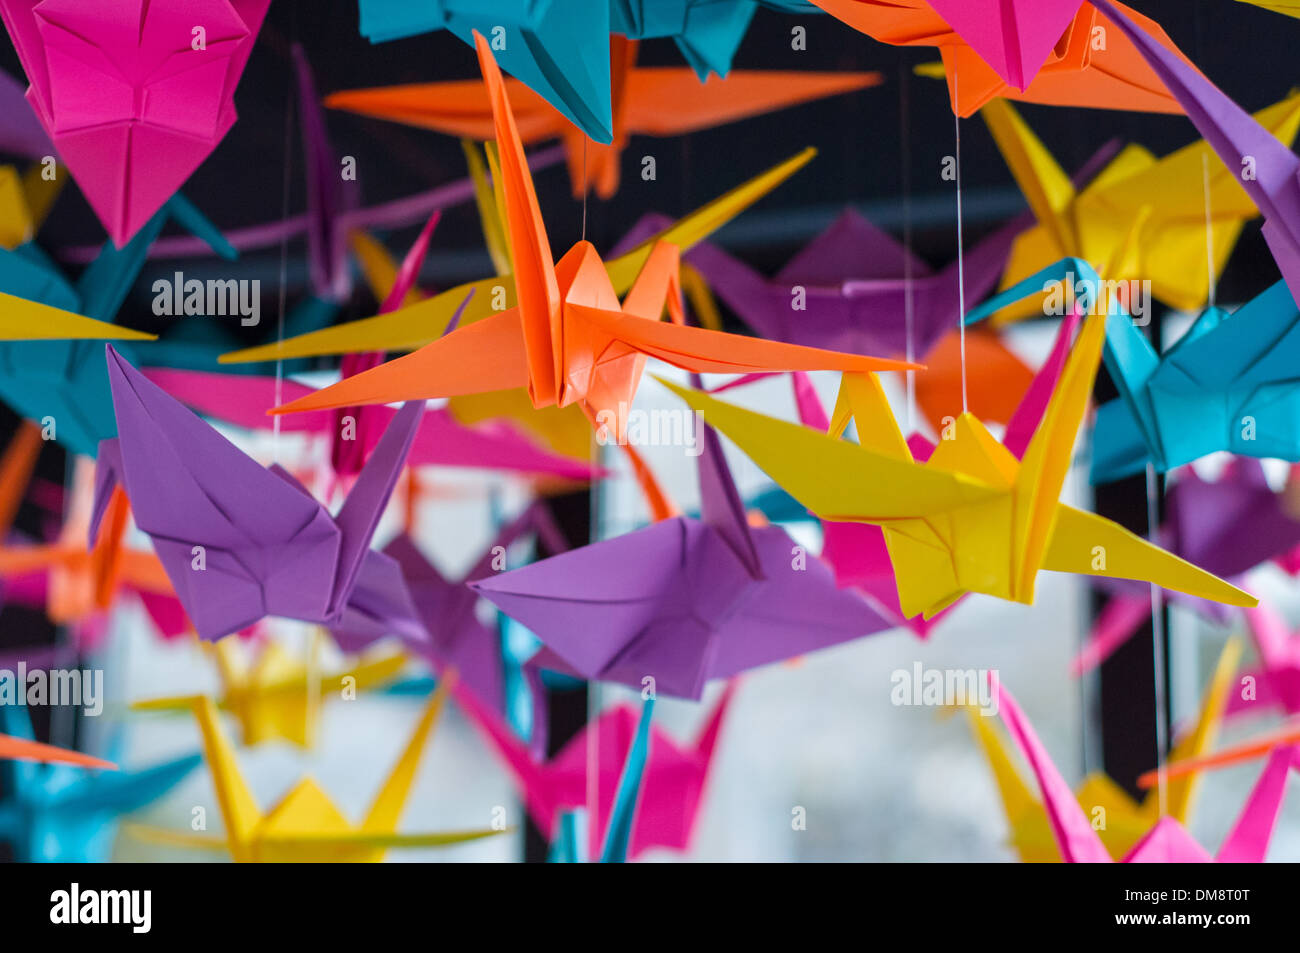 Colorido papel Origami Imagen De Stock